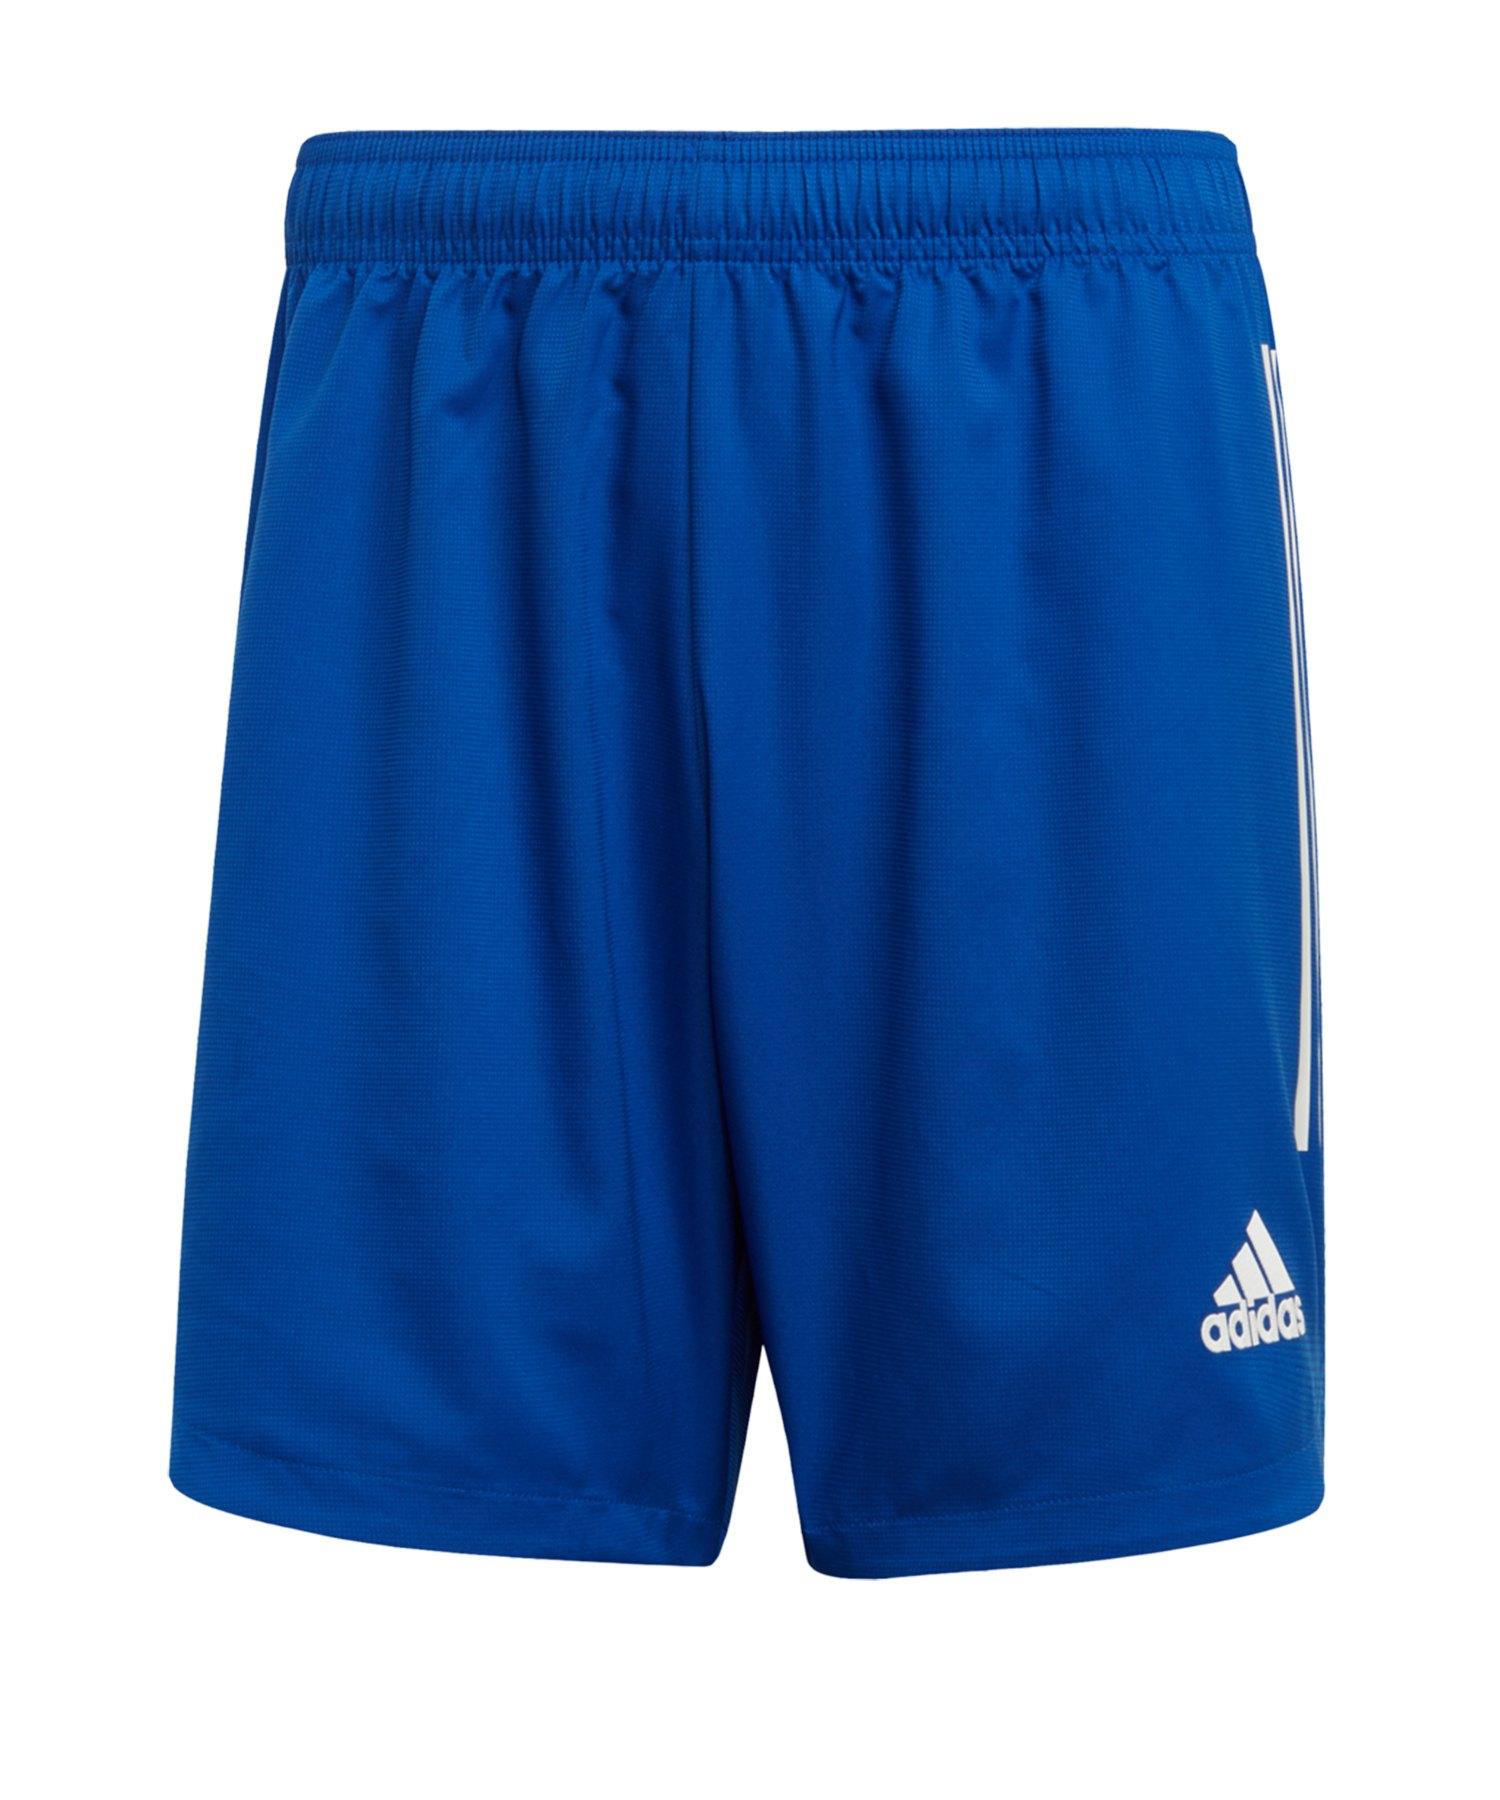 adidas Condivo 20 Short Blau Weiss - blau